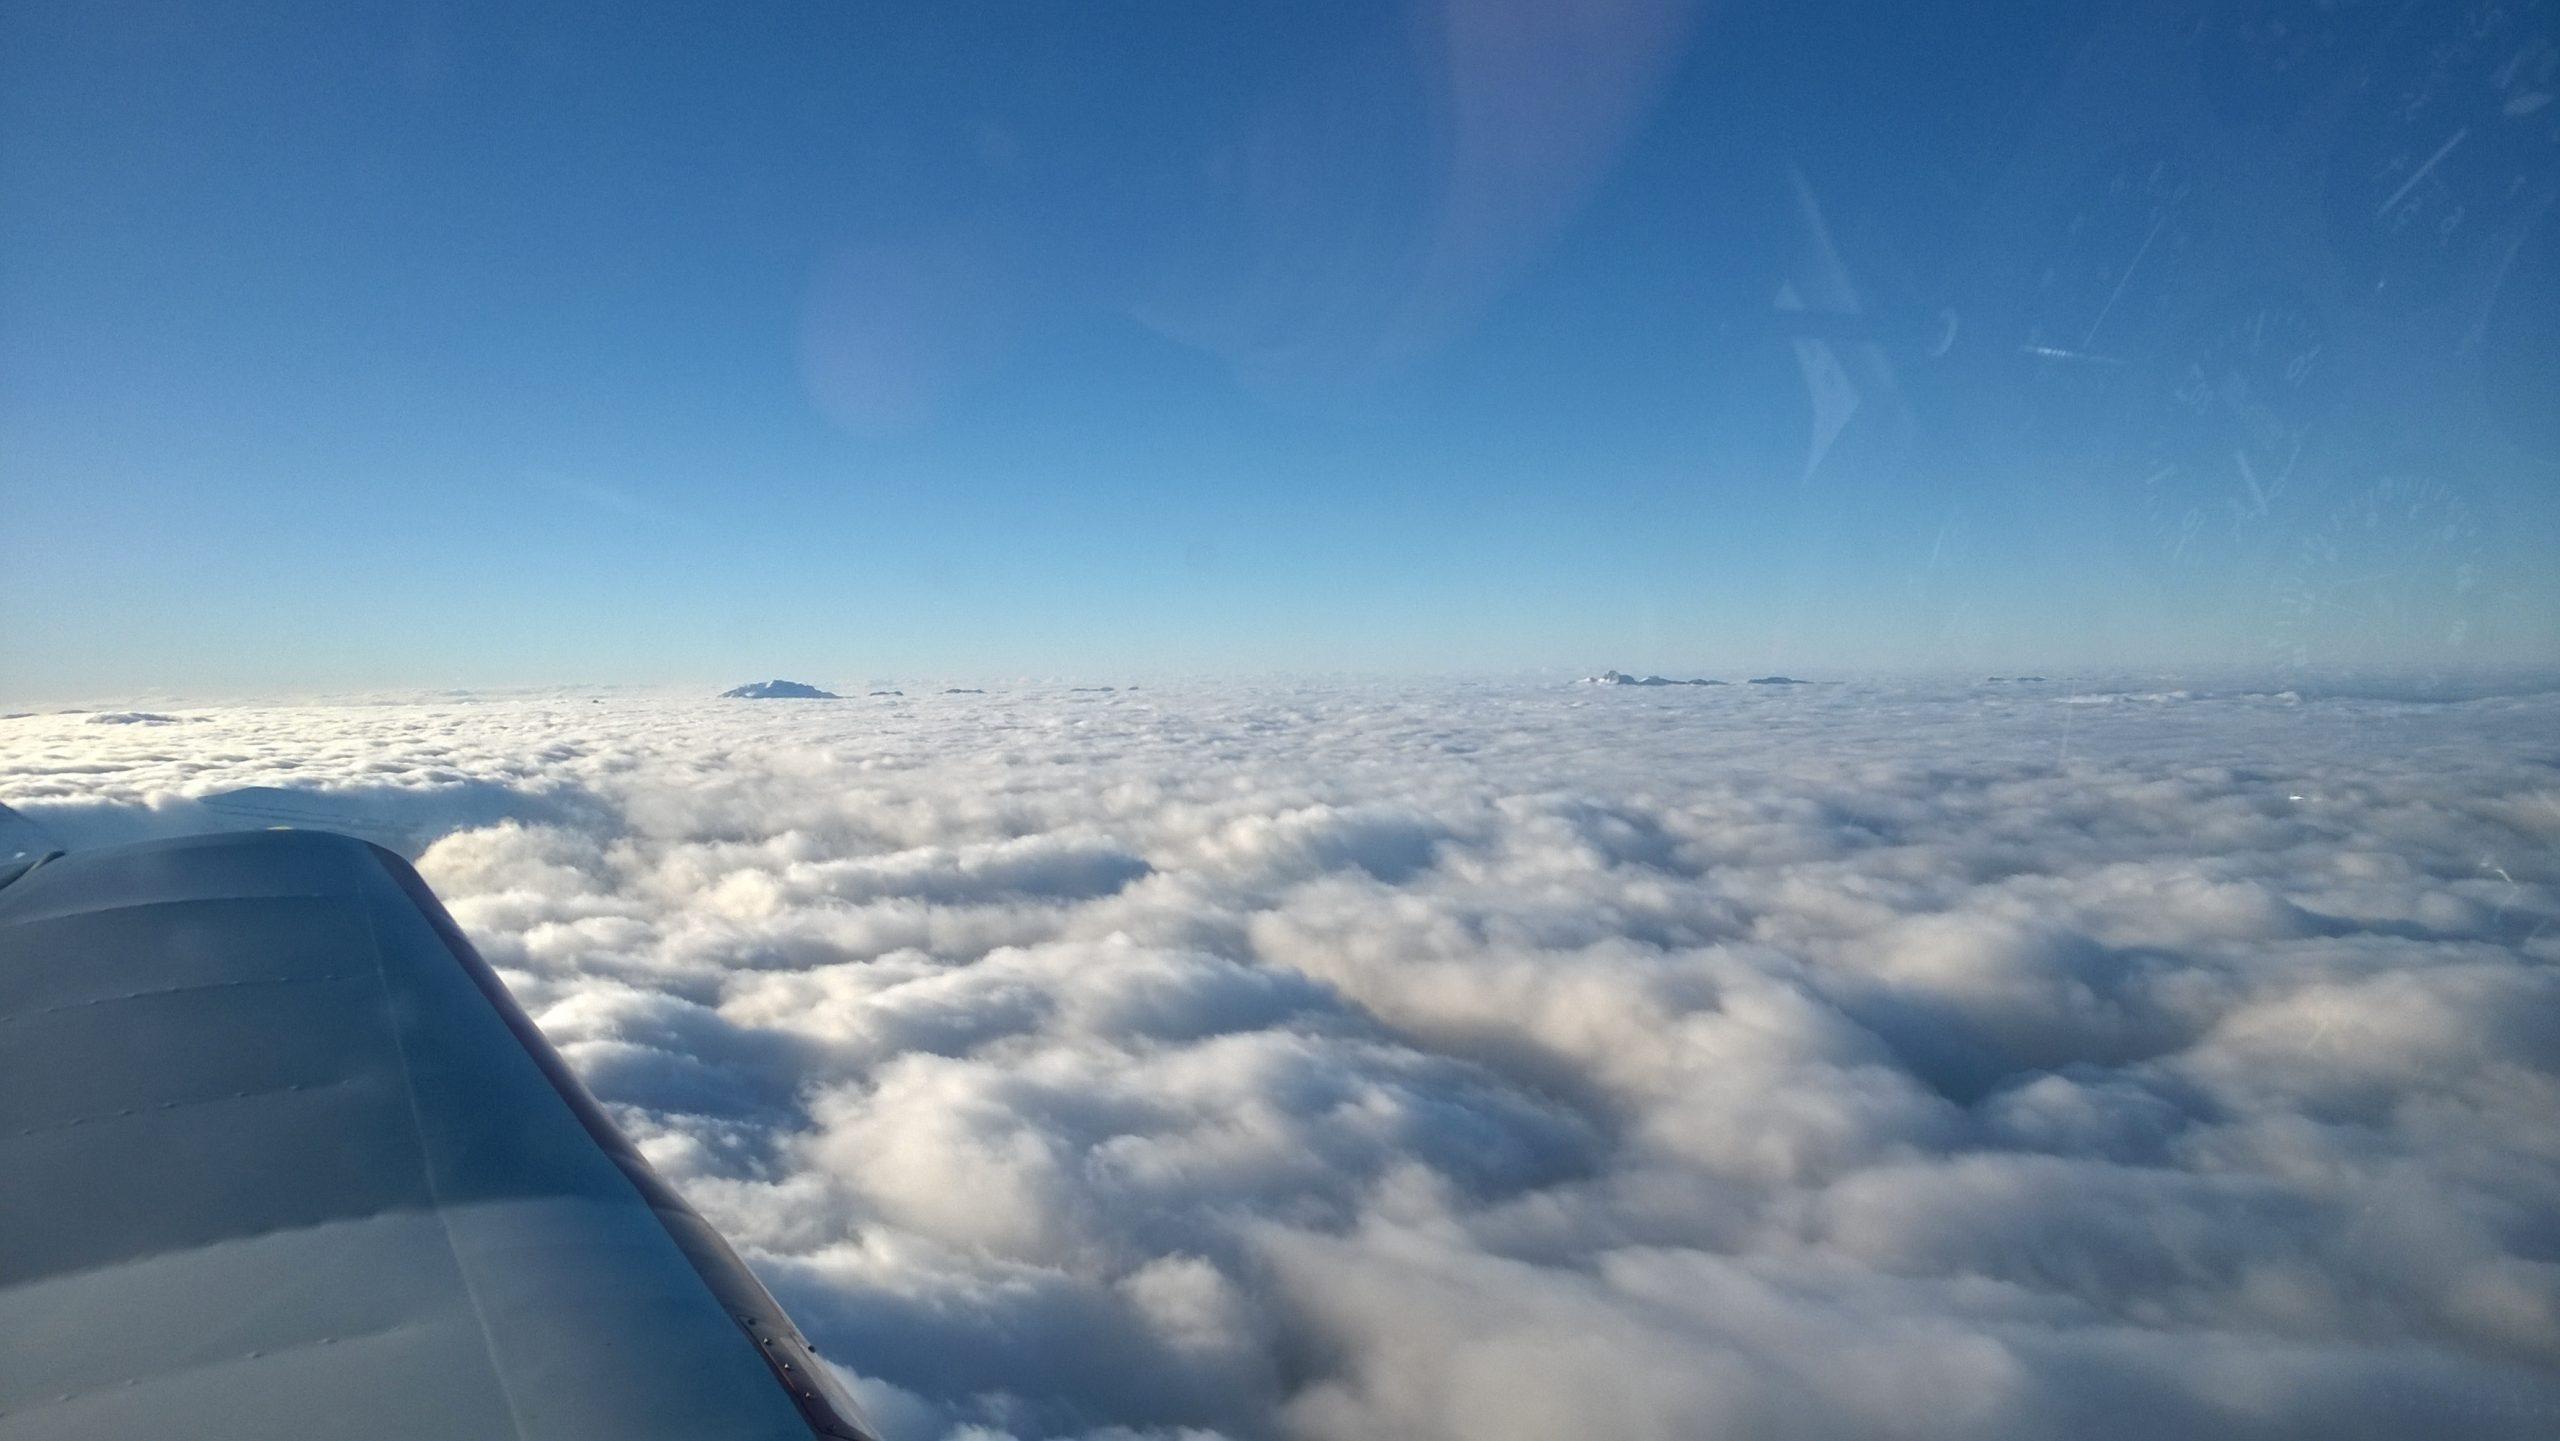 Voler en avion, PPL, LAPL, baptemes de l'air